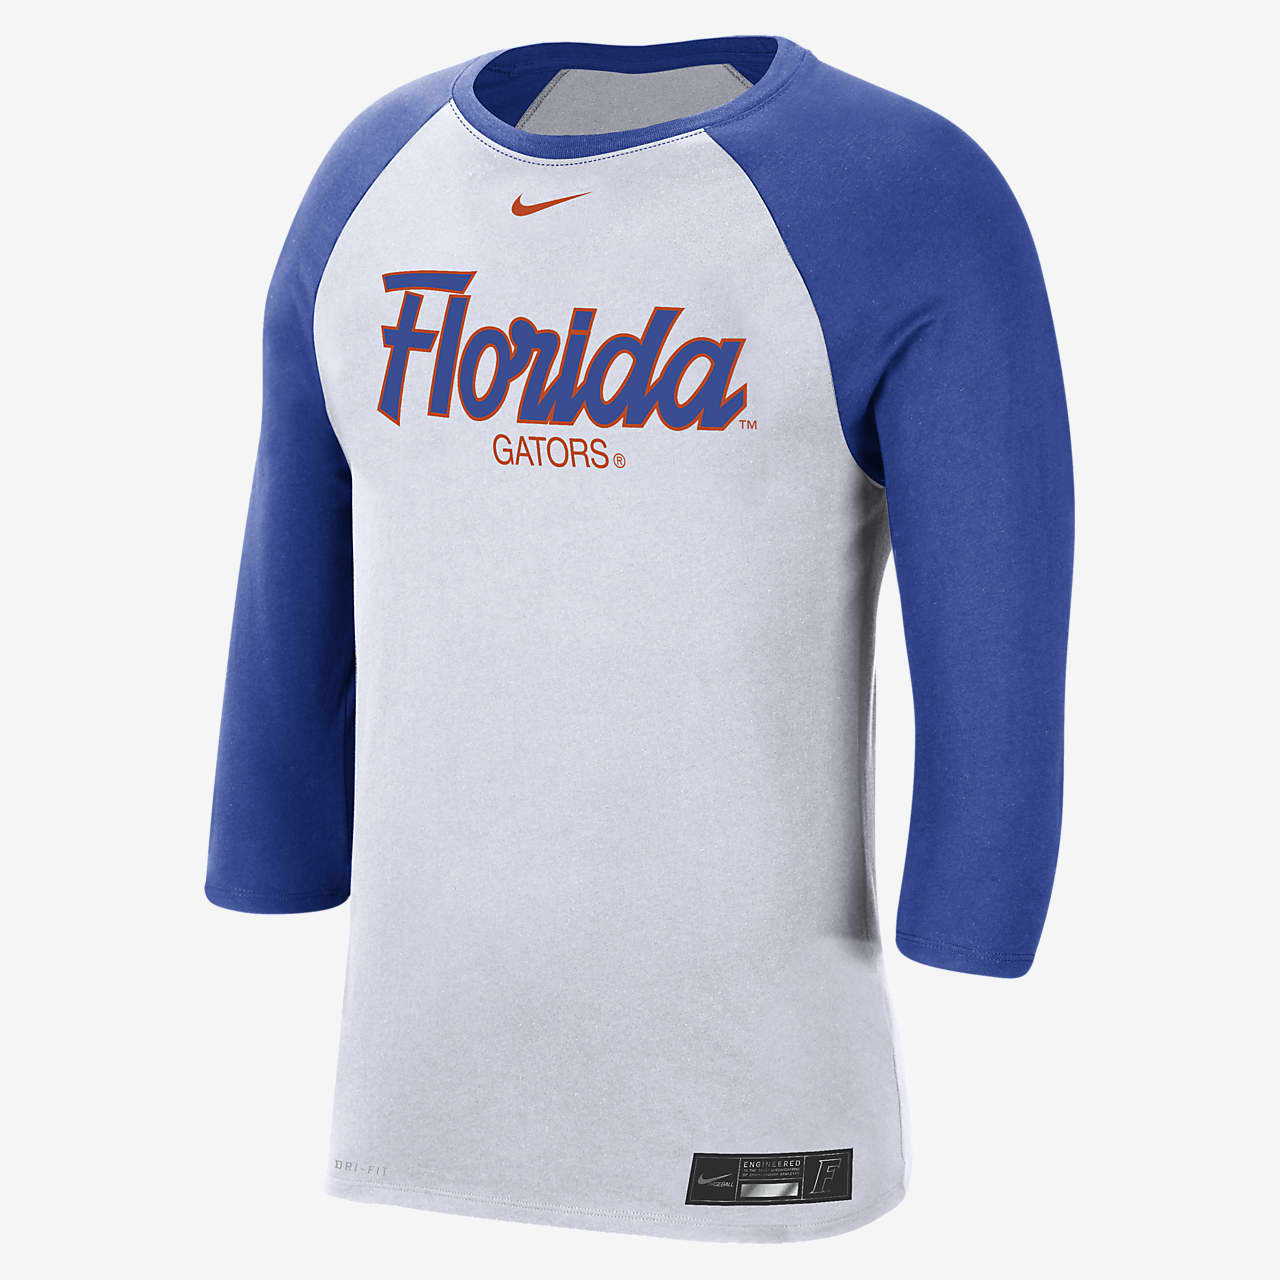 Nike College Dri-FIT (Florida) Men's 3/4-Sleeve T-Shirt